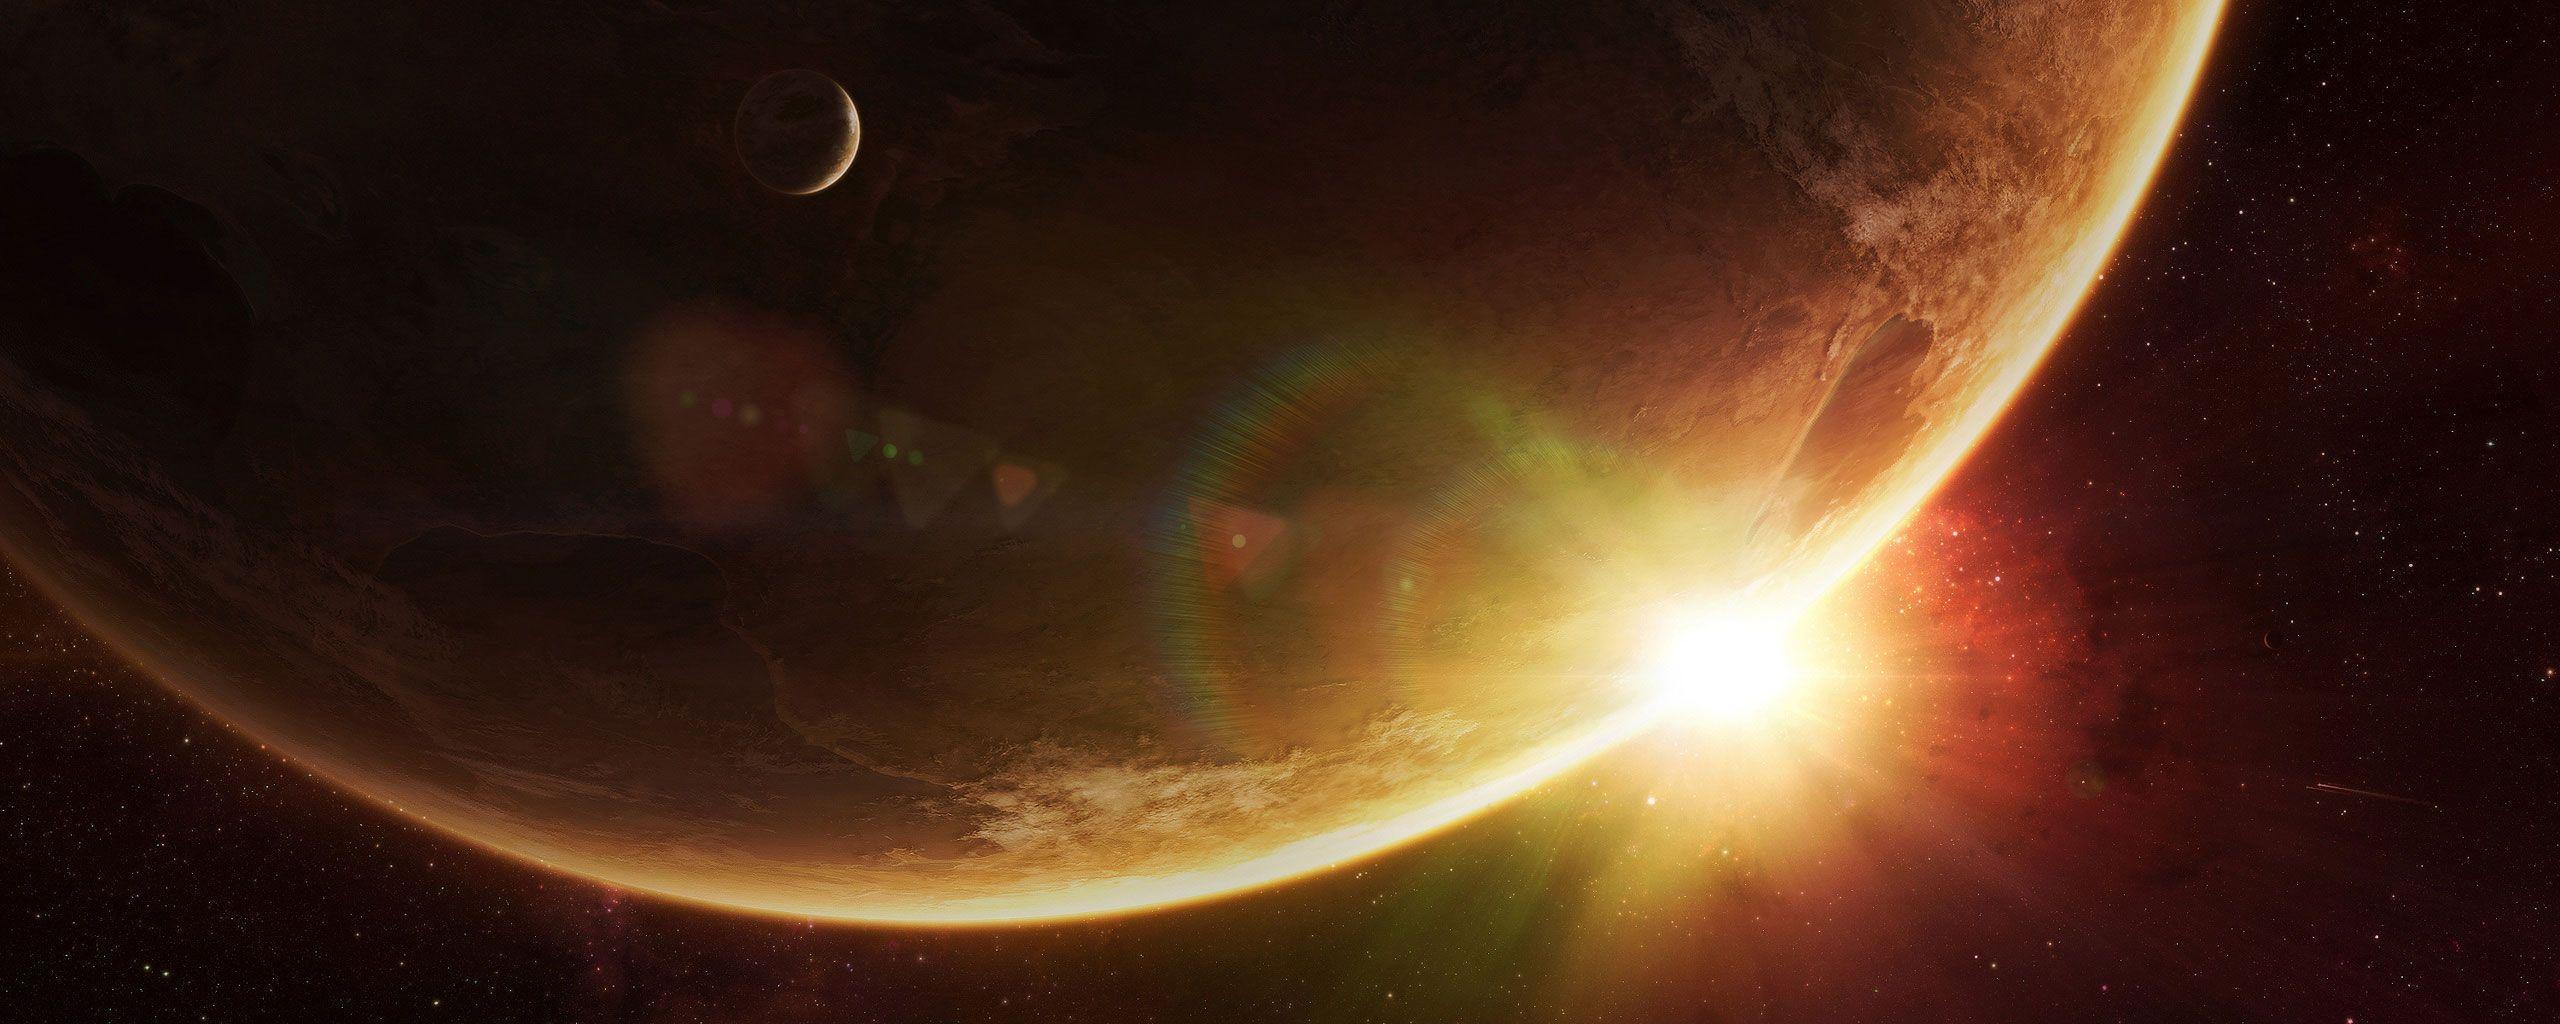 sun moon star background - photo #15